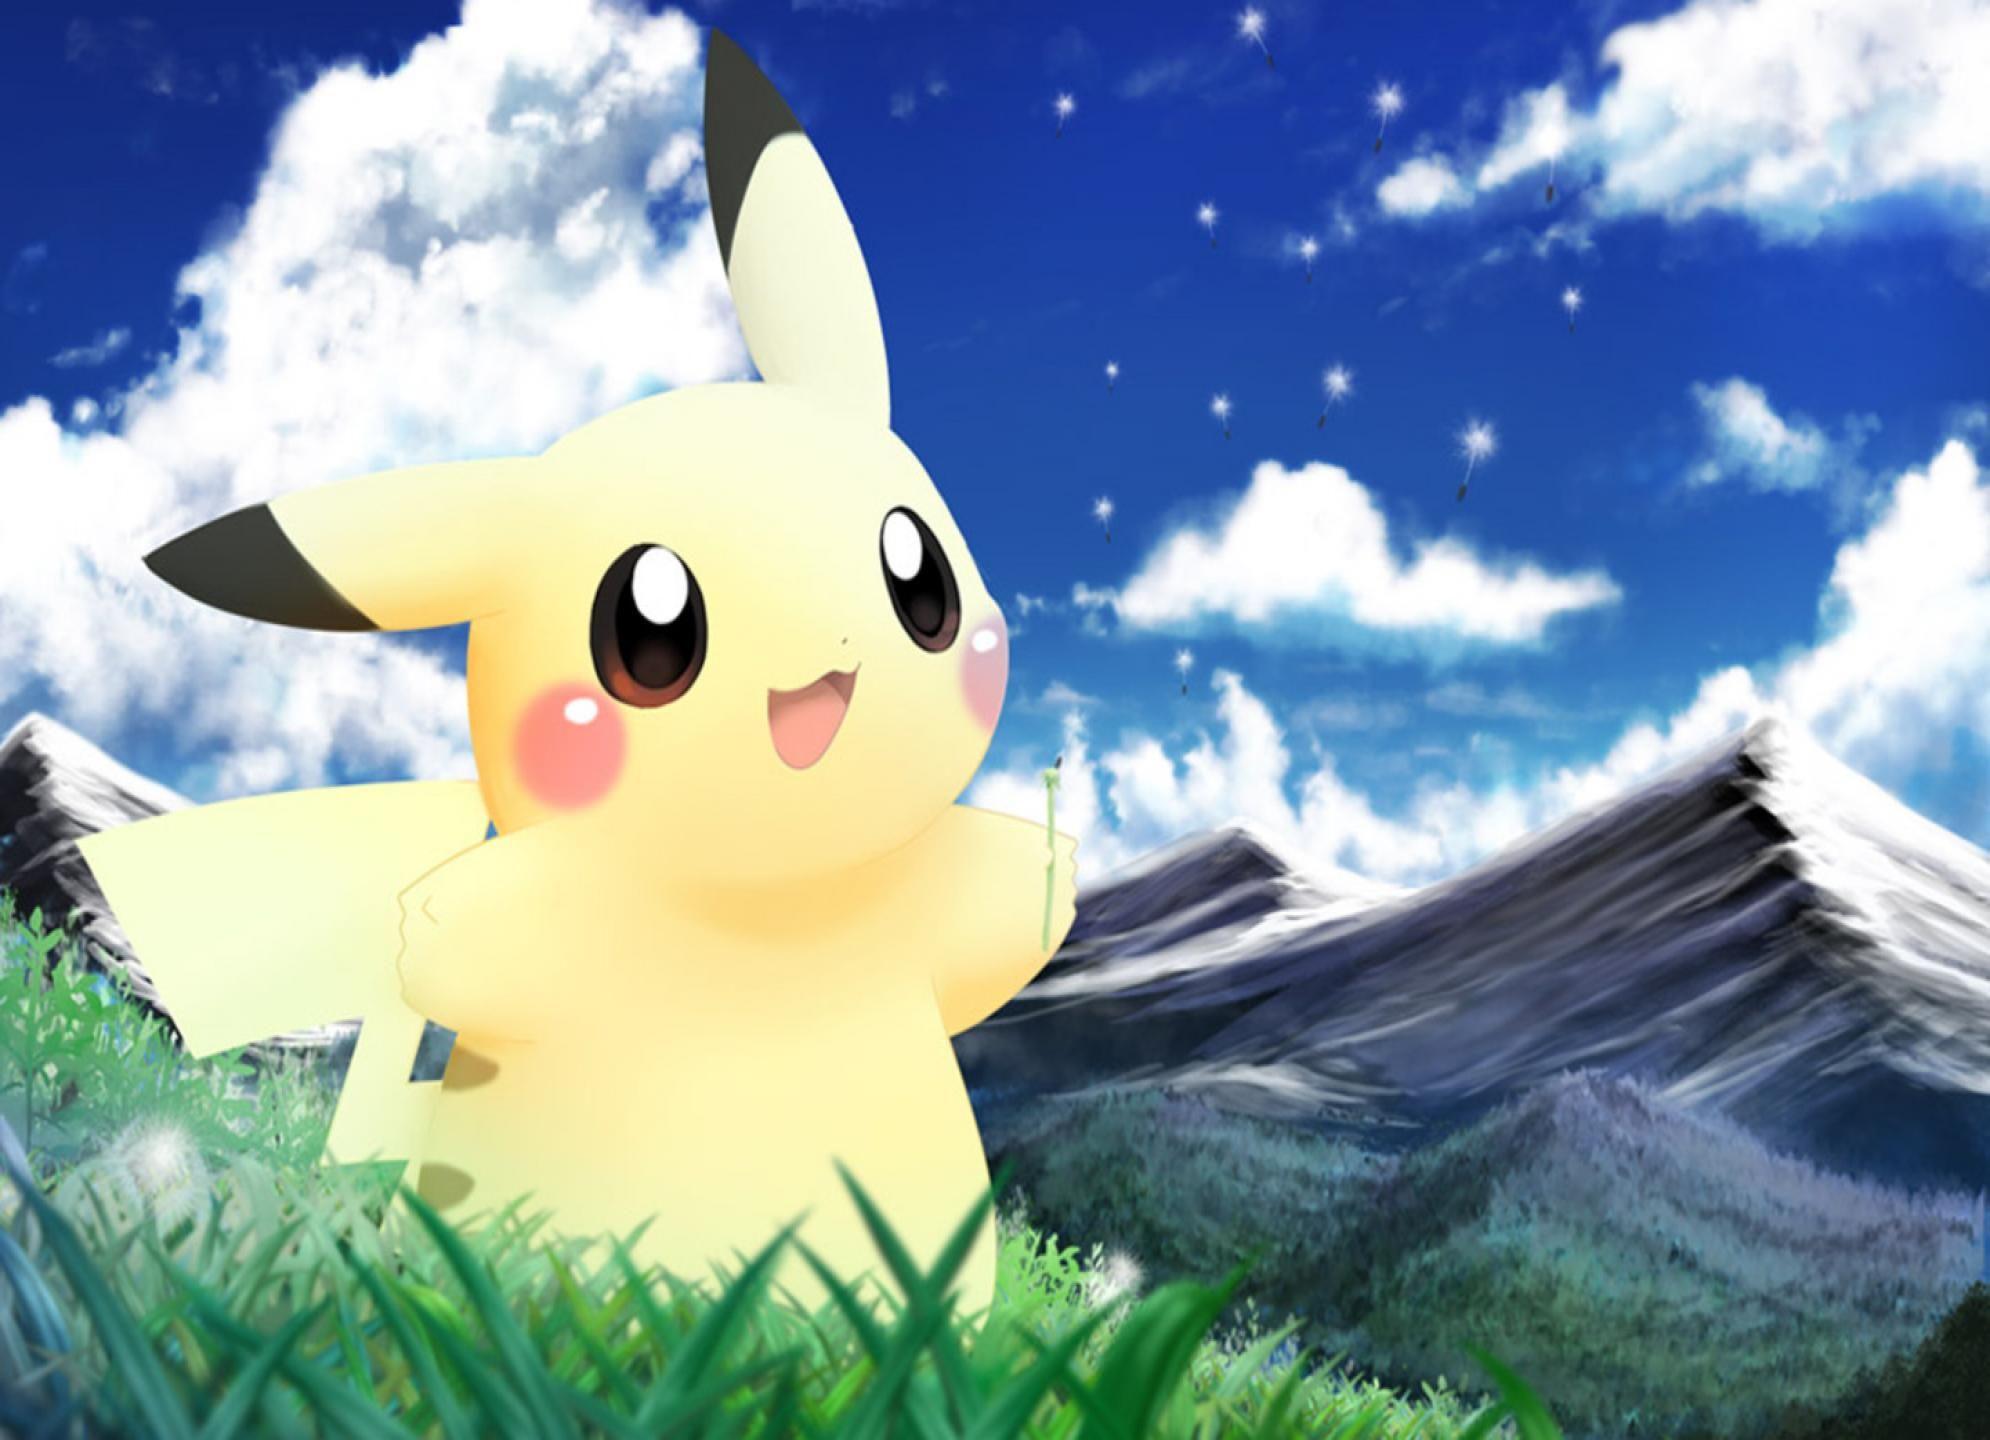 Cute Pikachu Wallpaper cutepikachuwallpaper5119hd